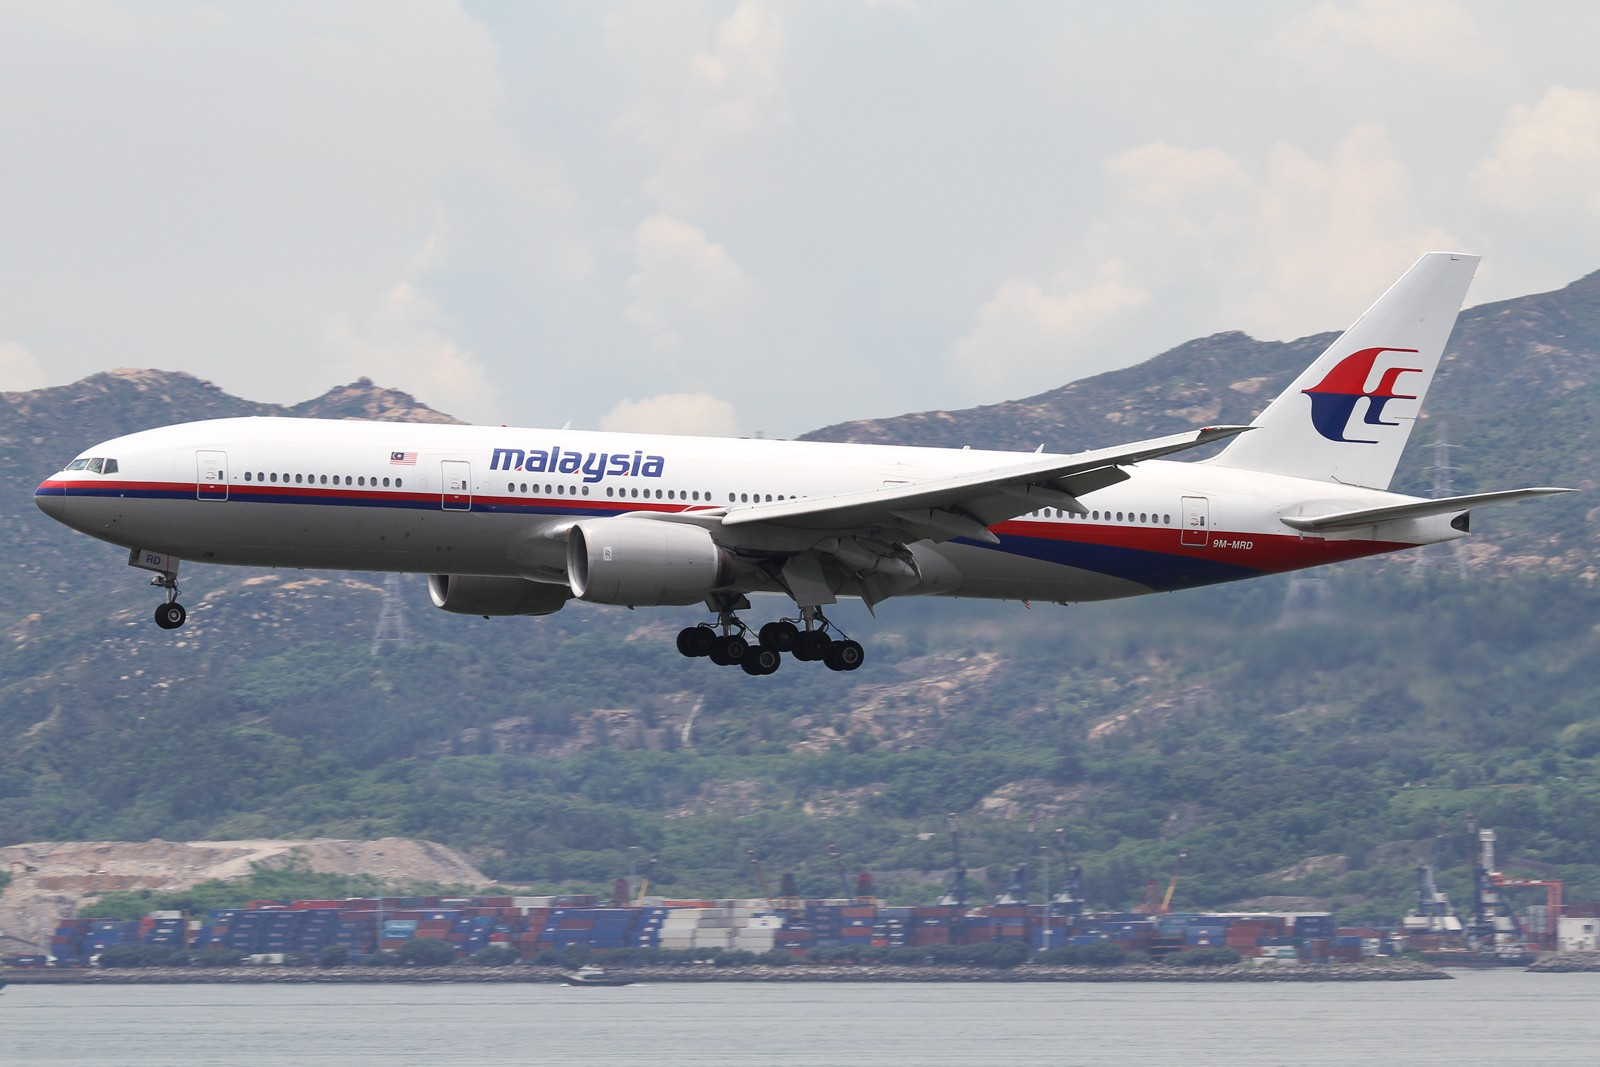 Re:[原创]【SHA/PVG/NKG/HKG/PEK】***********2014年度总结*********** BOEING 777-200ER 9M-MRD 中国香港赤鱲角国际机场